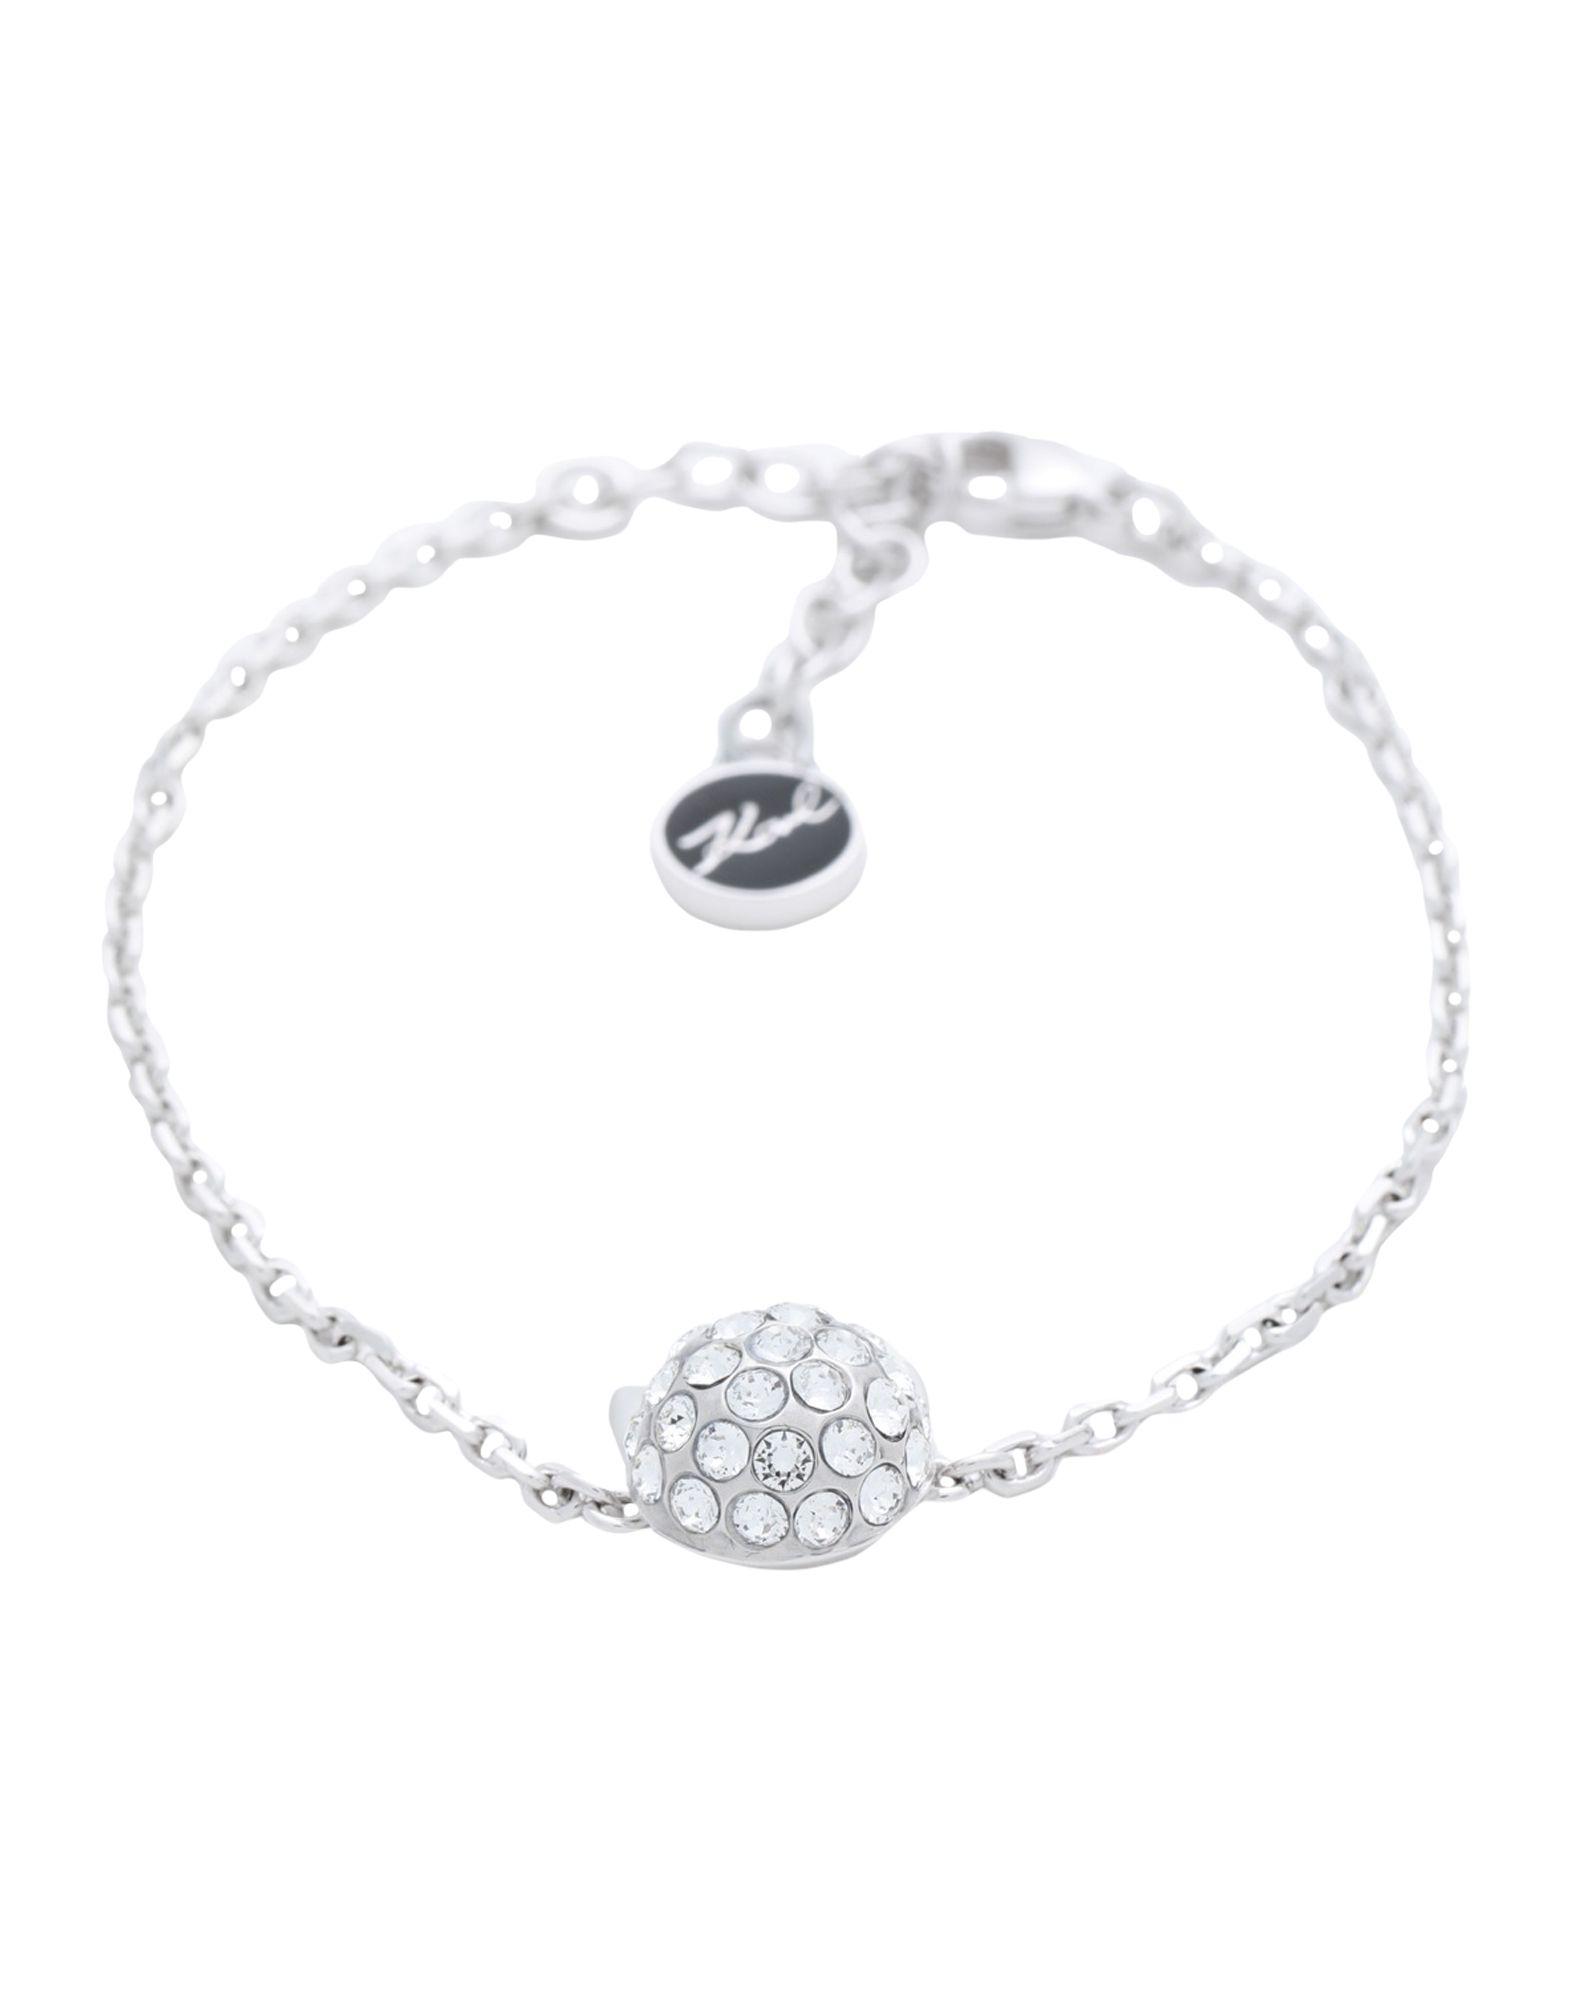 KARL LAGERFELD Bracelets - Item 50243630